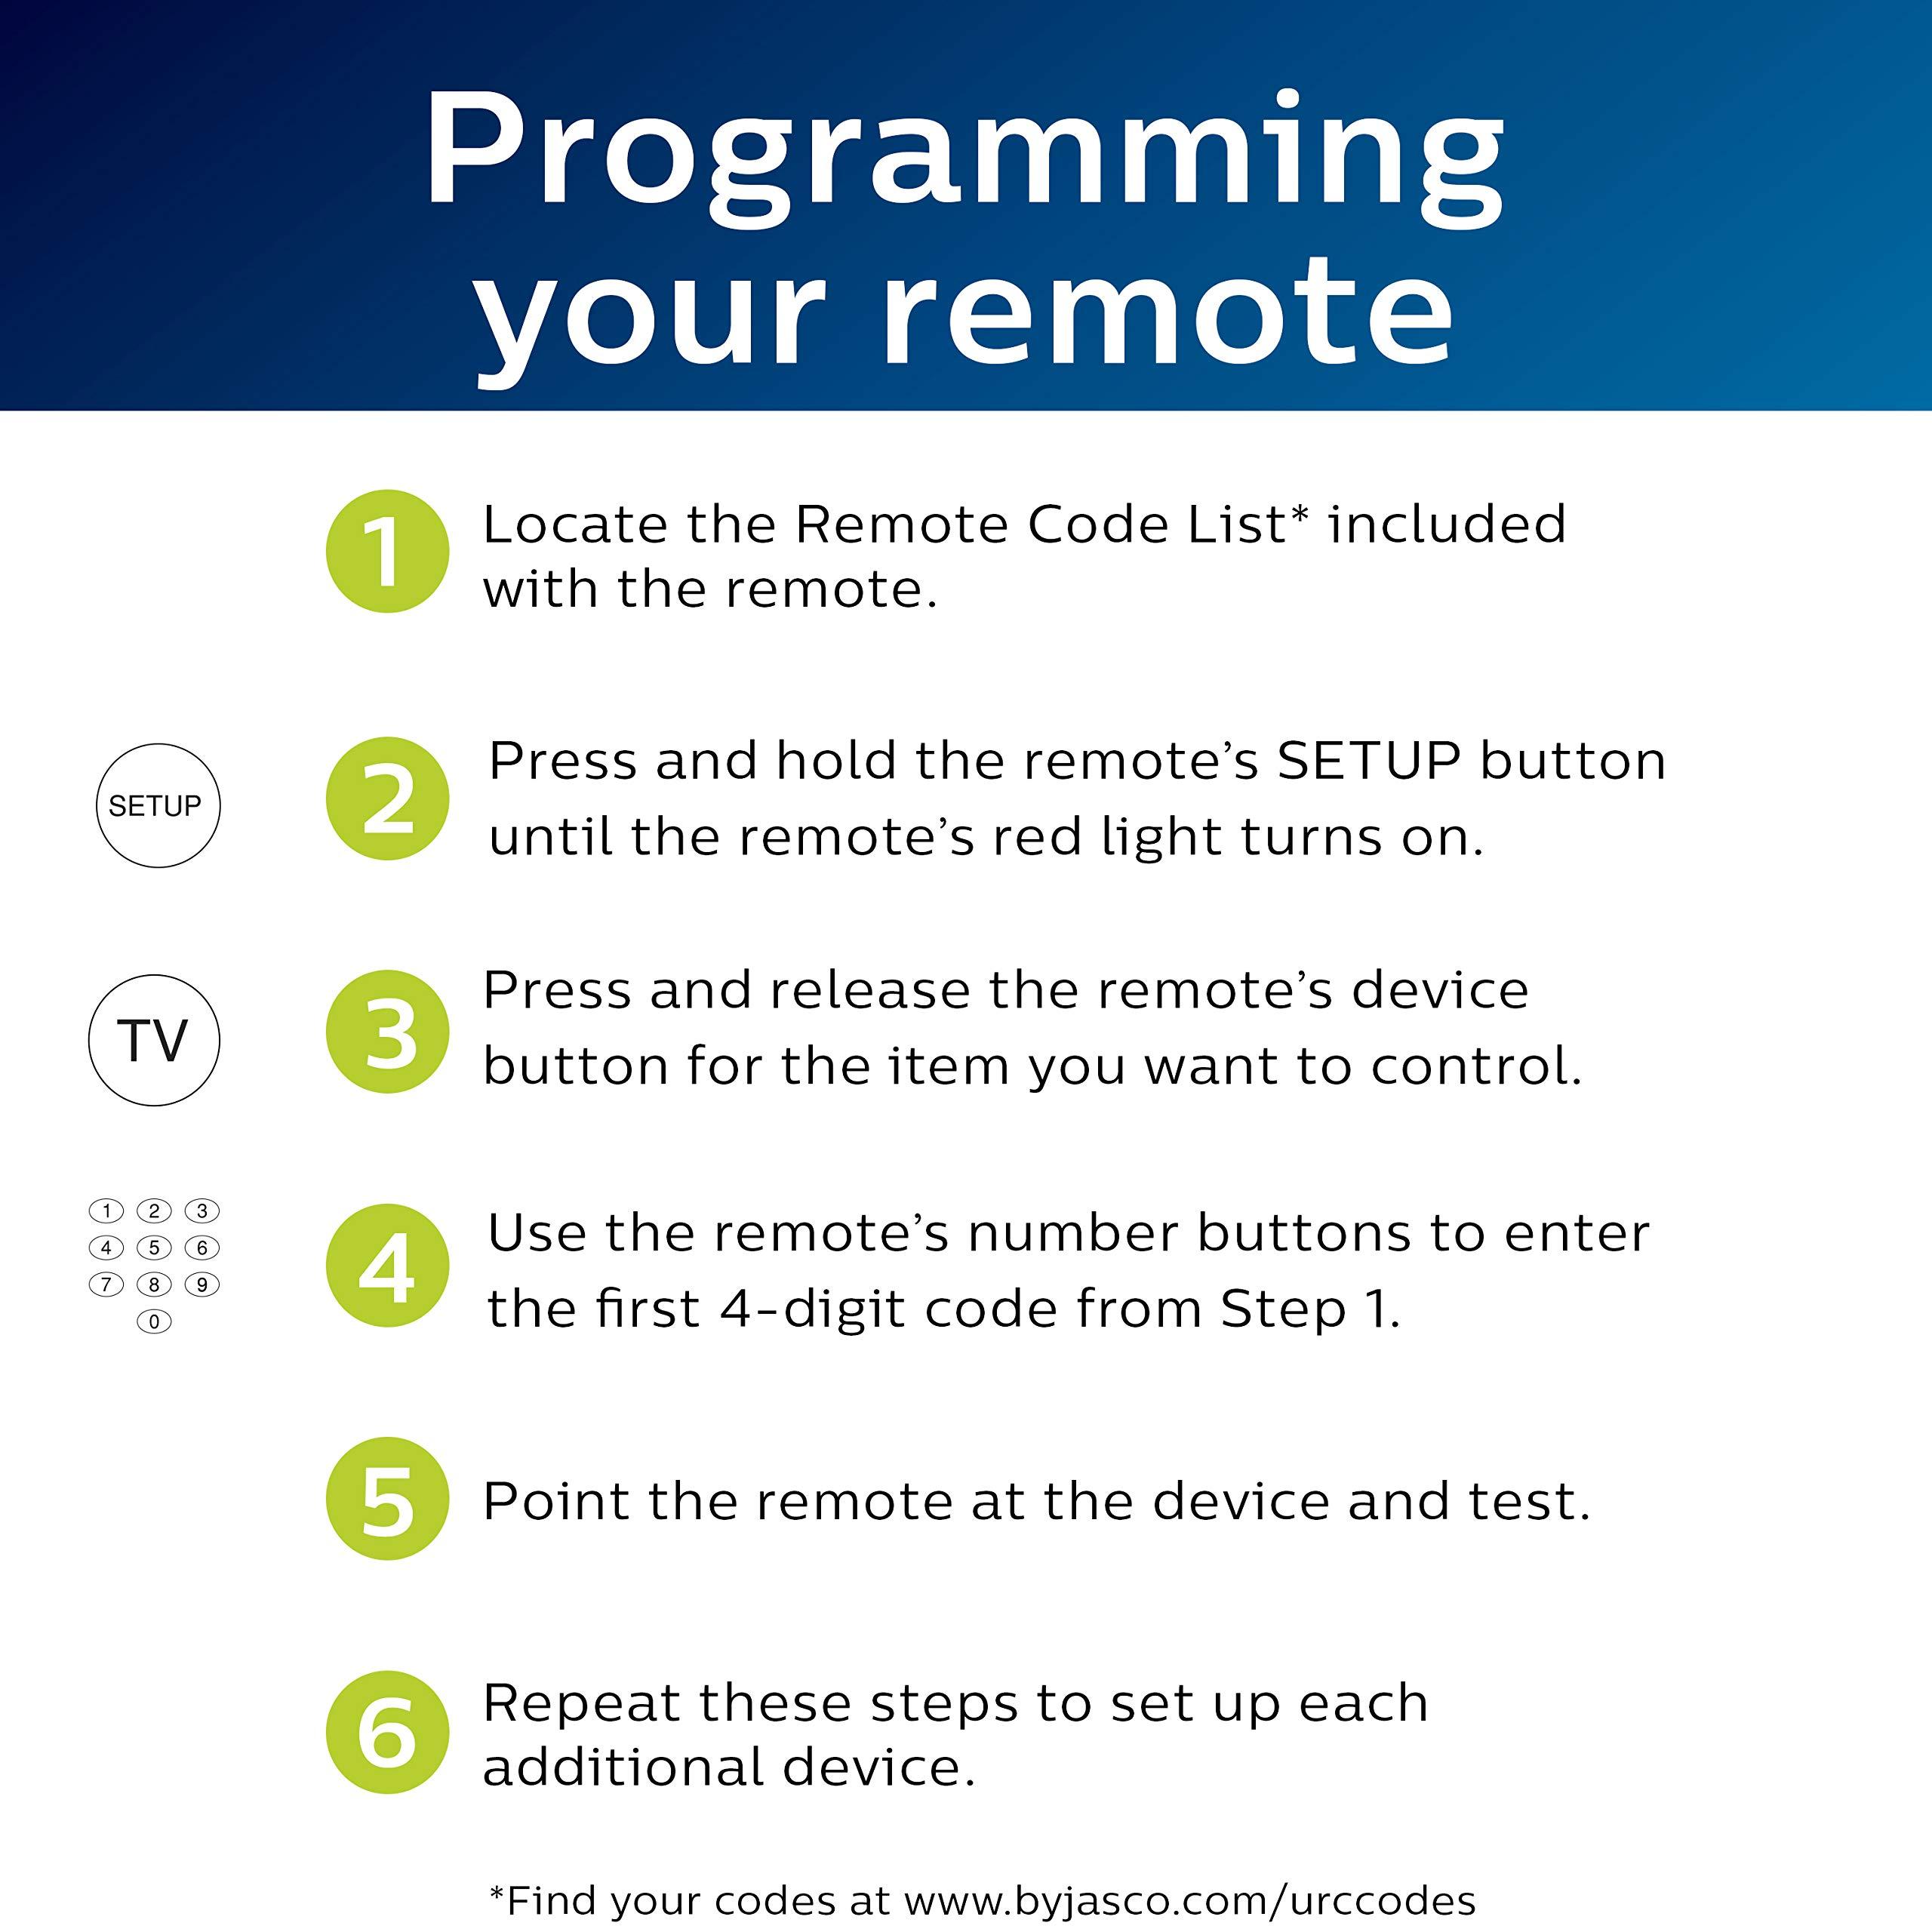 Philips Mando a distancia universal para Samsung, Vizio, LG, Sony, Sharp, Roku, Apple TV, RCA, Panasonic, Smart TVs, reproductores de streaming, Blu-ray, DVD, configuración simple, 4 dispositivos, grafito, SRP2014H/27: Amazon.es: Electrónica